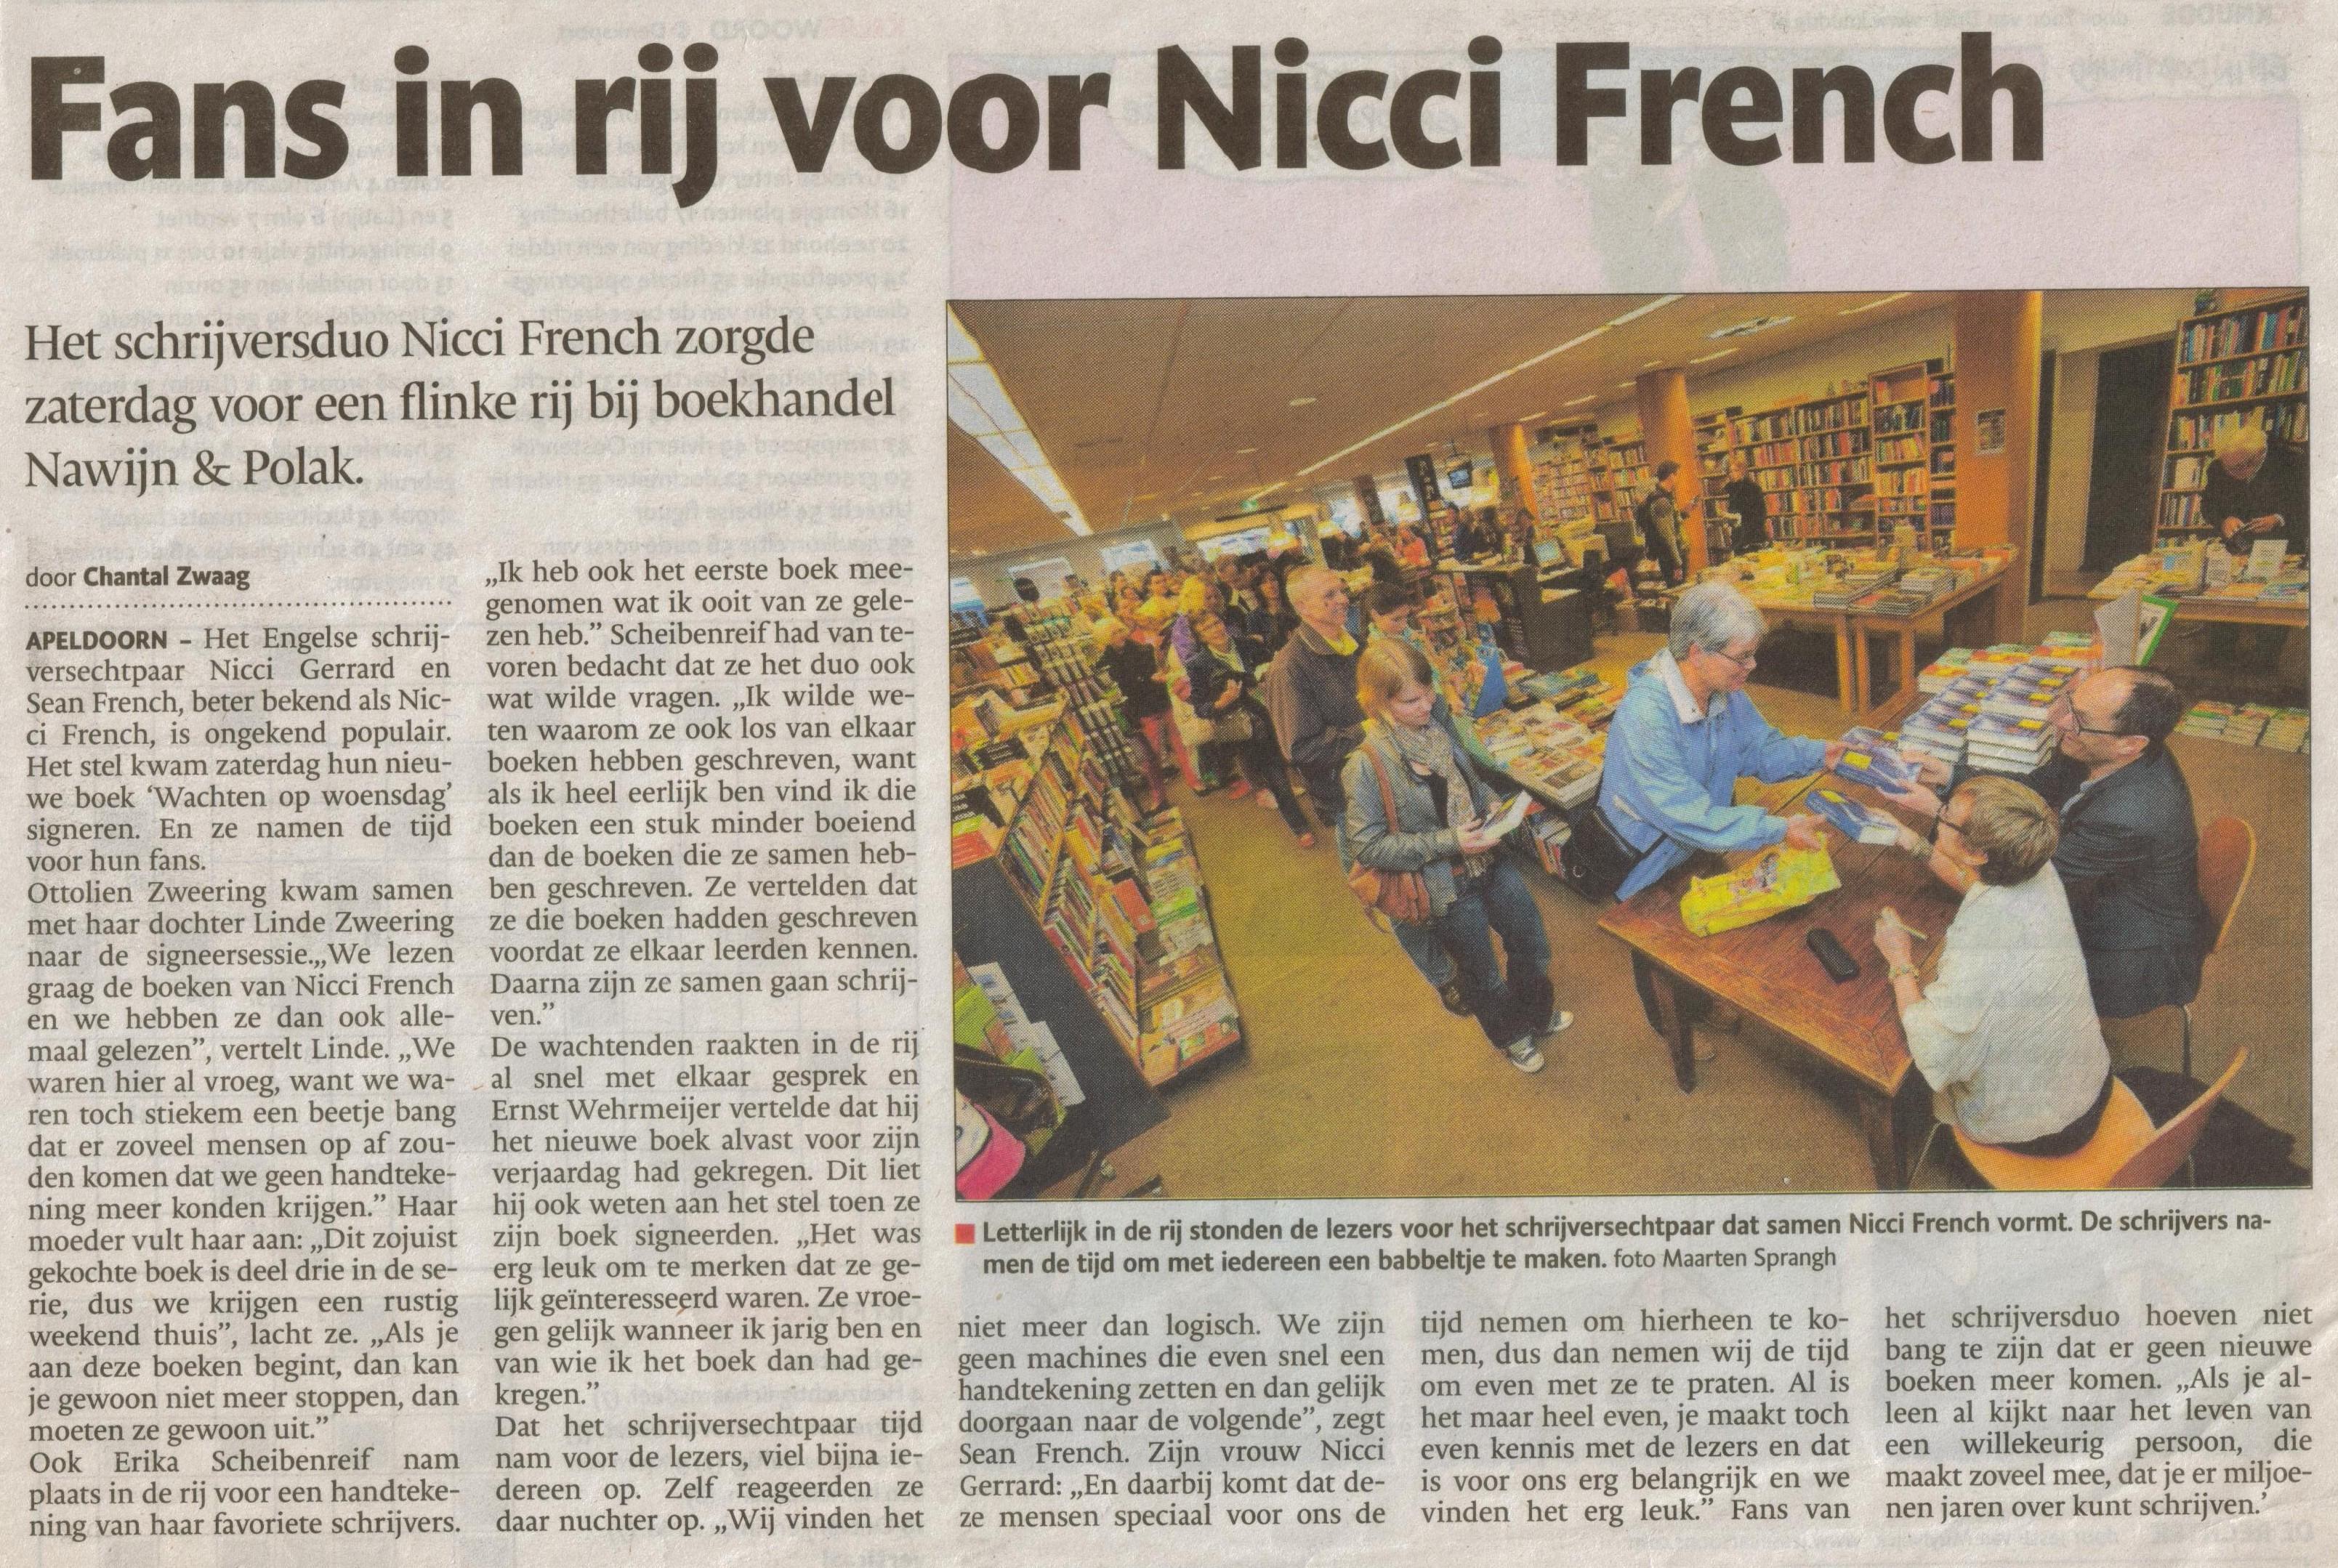 1- nicci french bij nawijn en polak-publicatiedatum 3 juni 2013